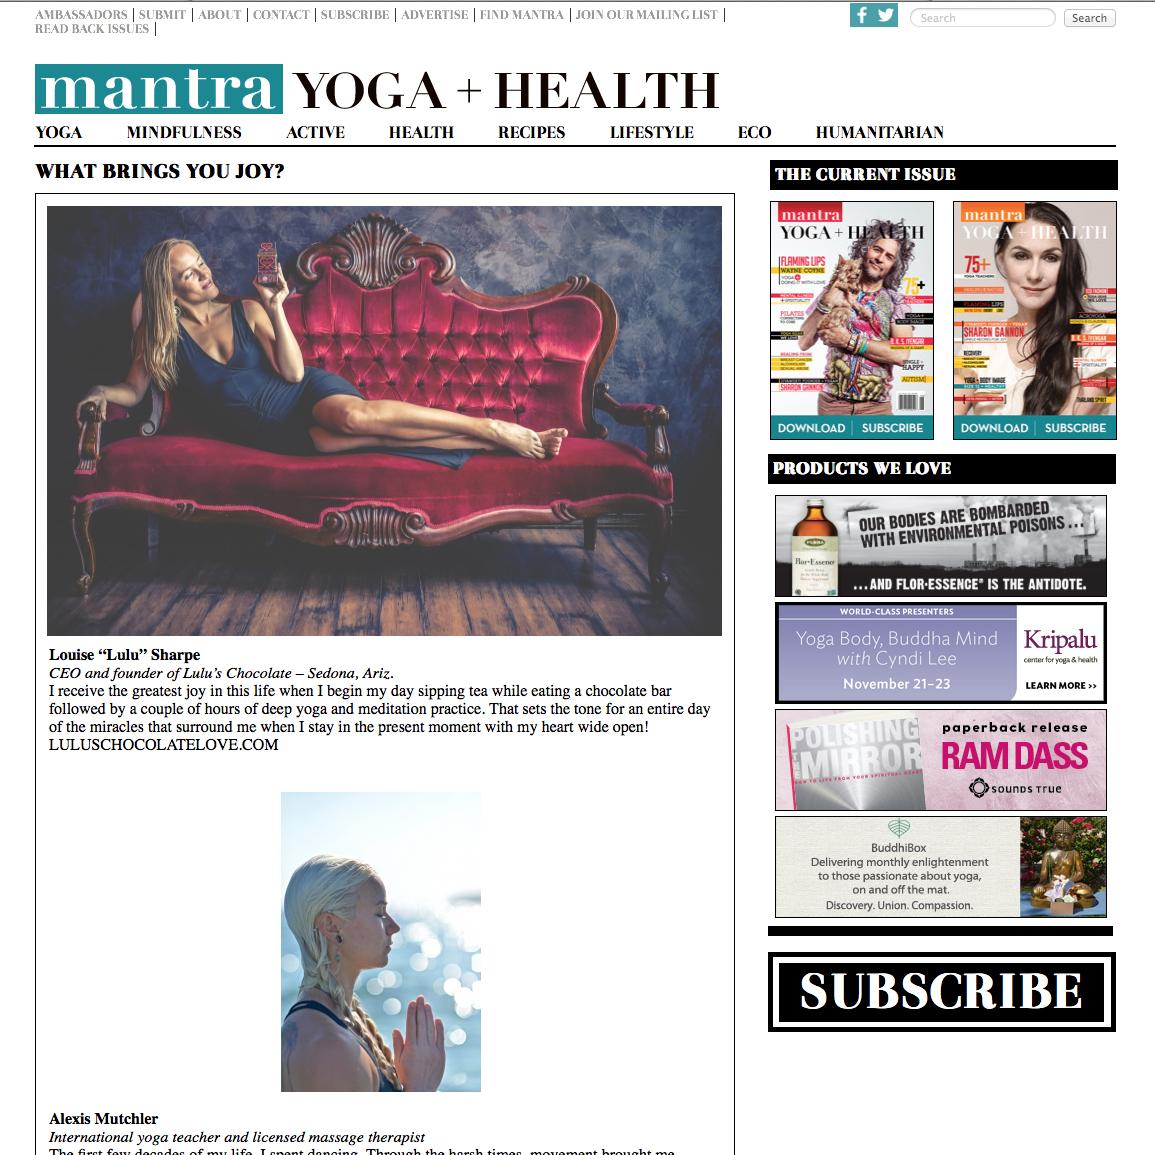 mantra-yoga-health